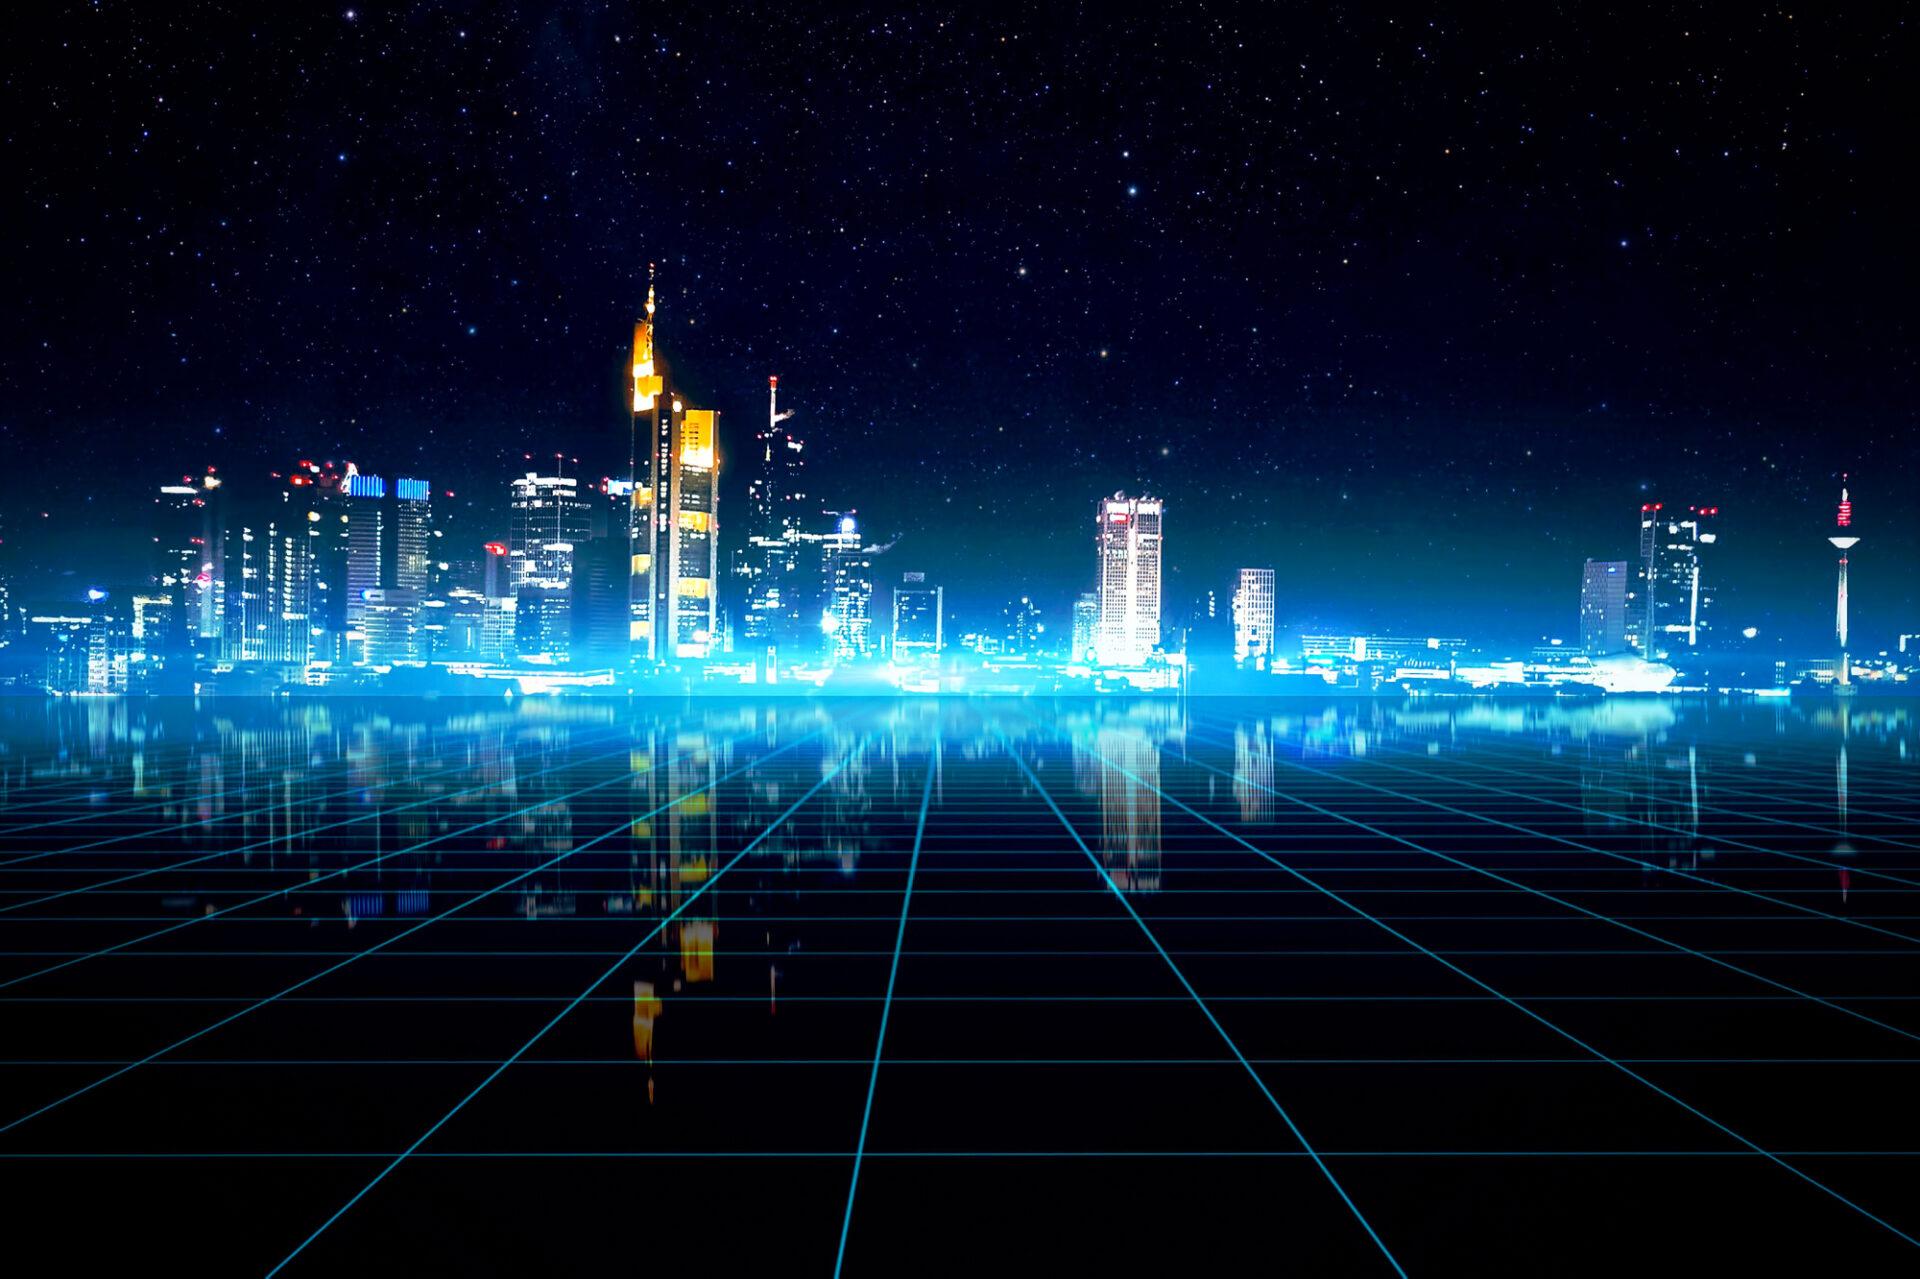 Futuristic picture of Franfurt by night